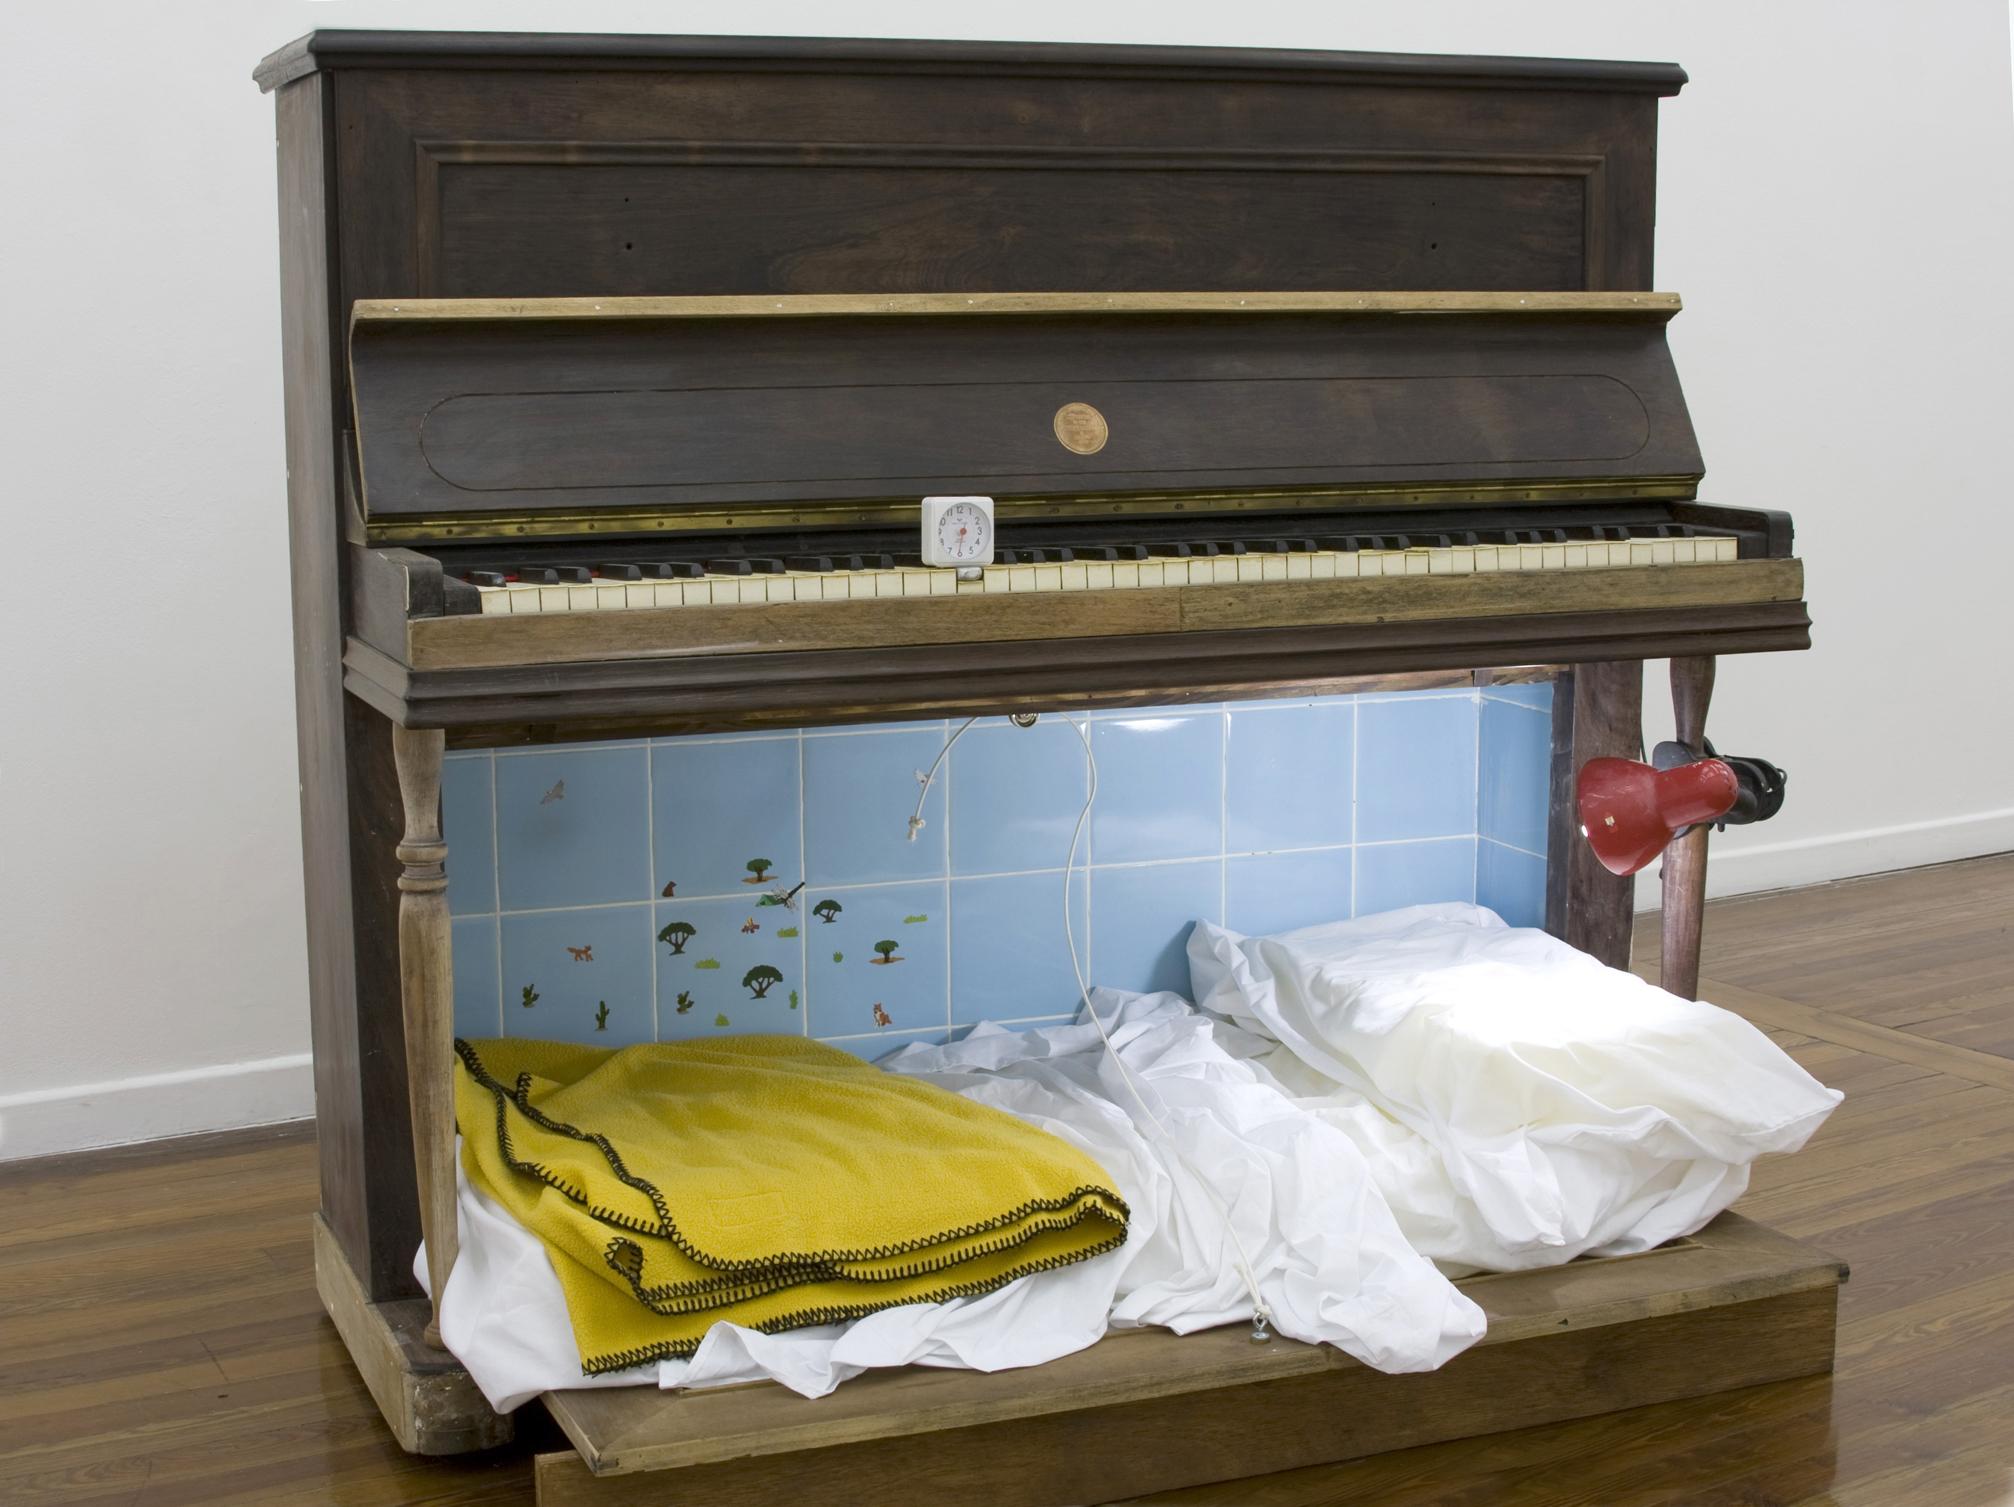 Sin titulo -Piano intervenido- (2008) de Nicolás Bacal.jpg